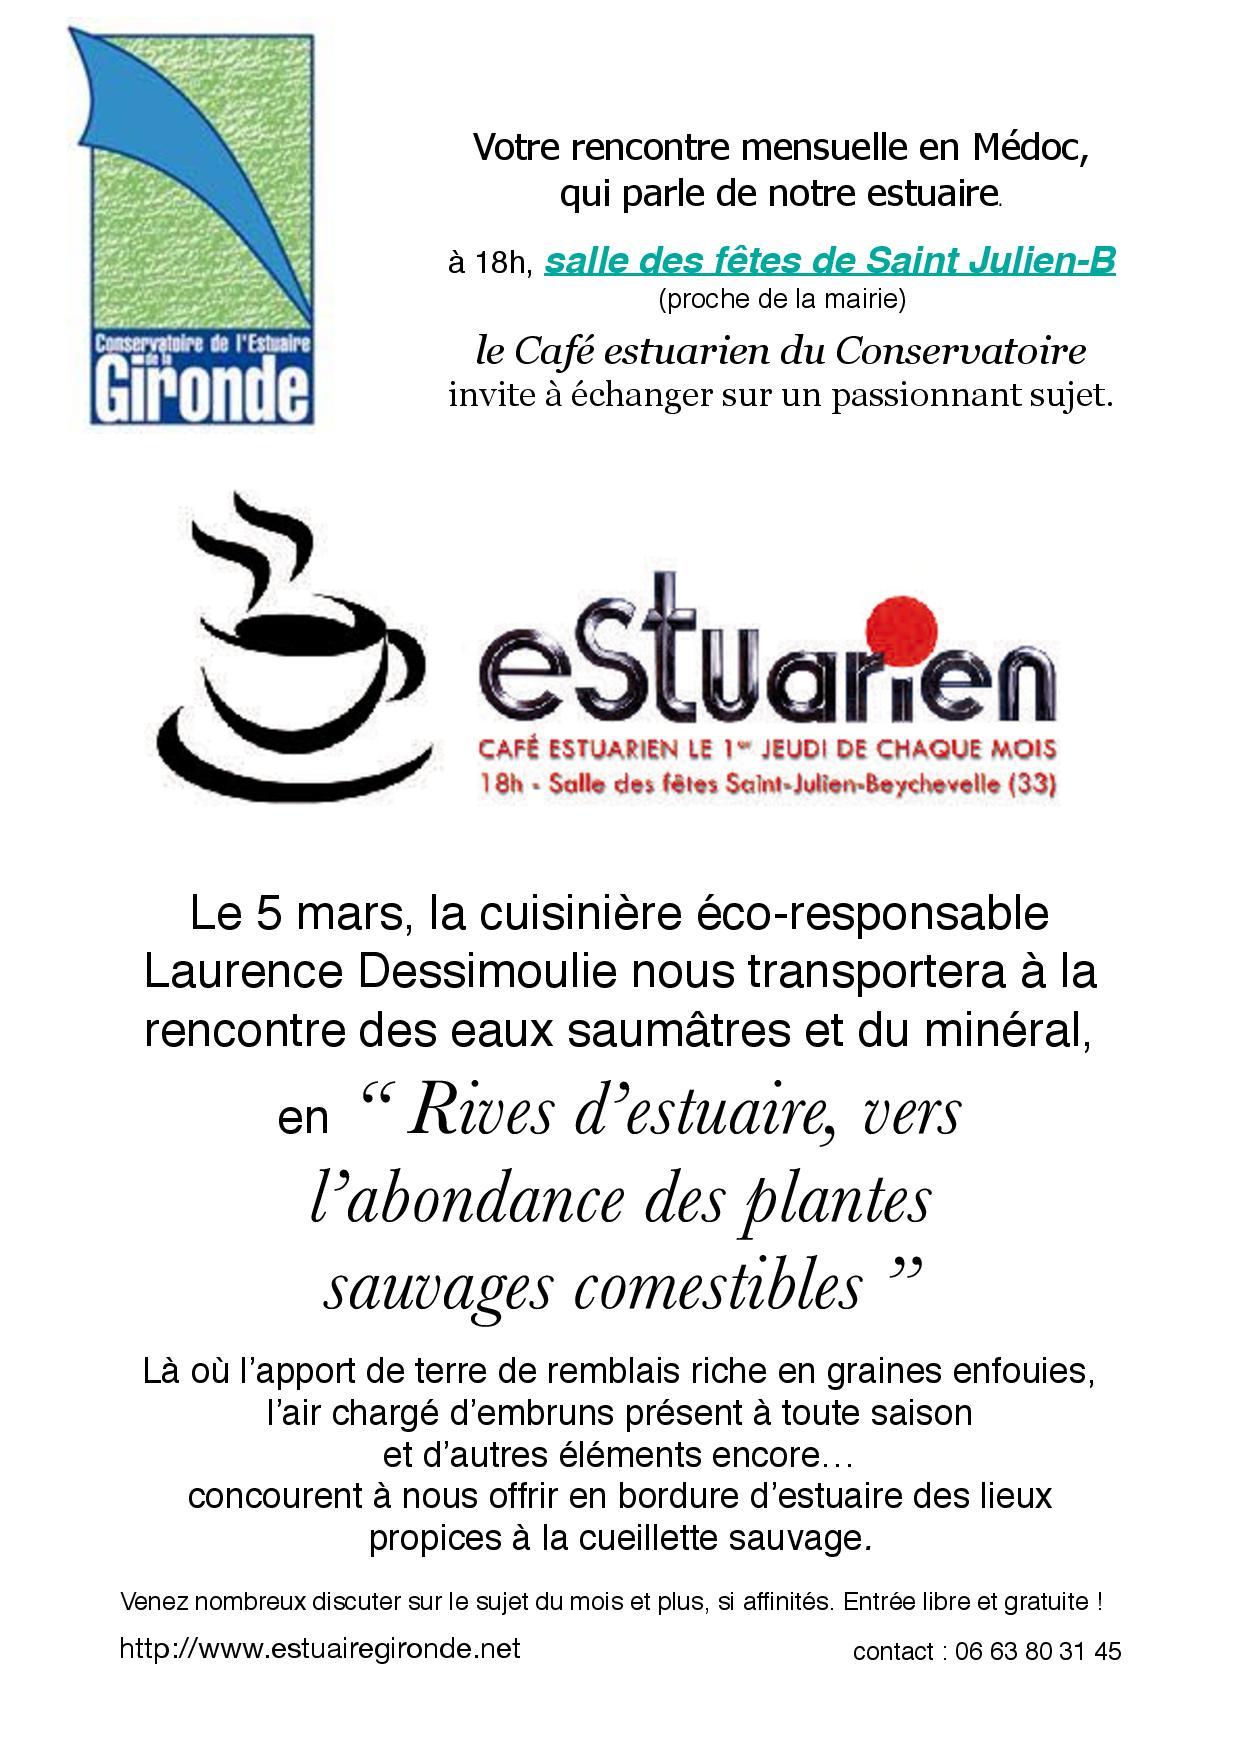 café estuarien 5 mars